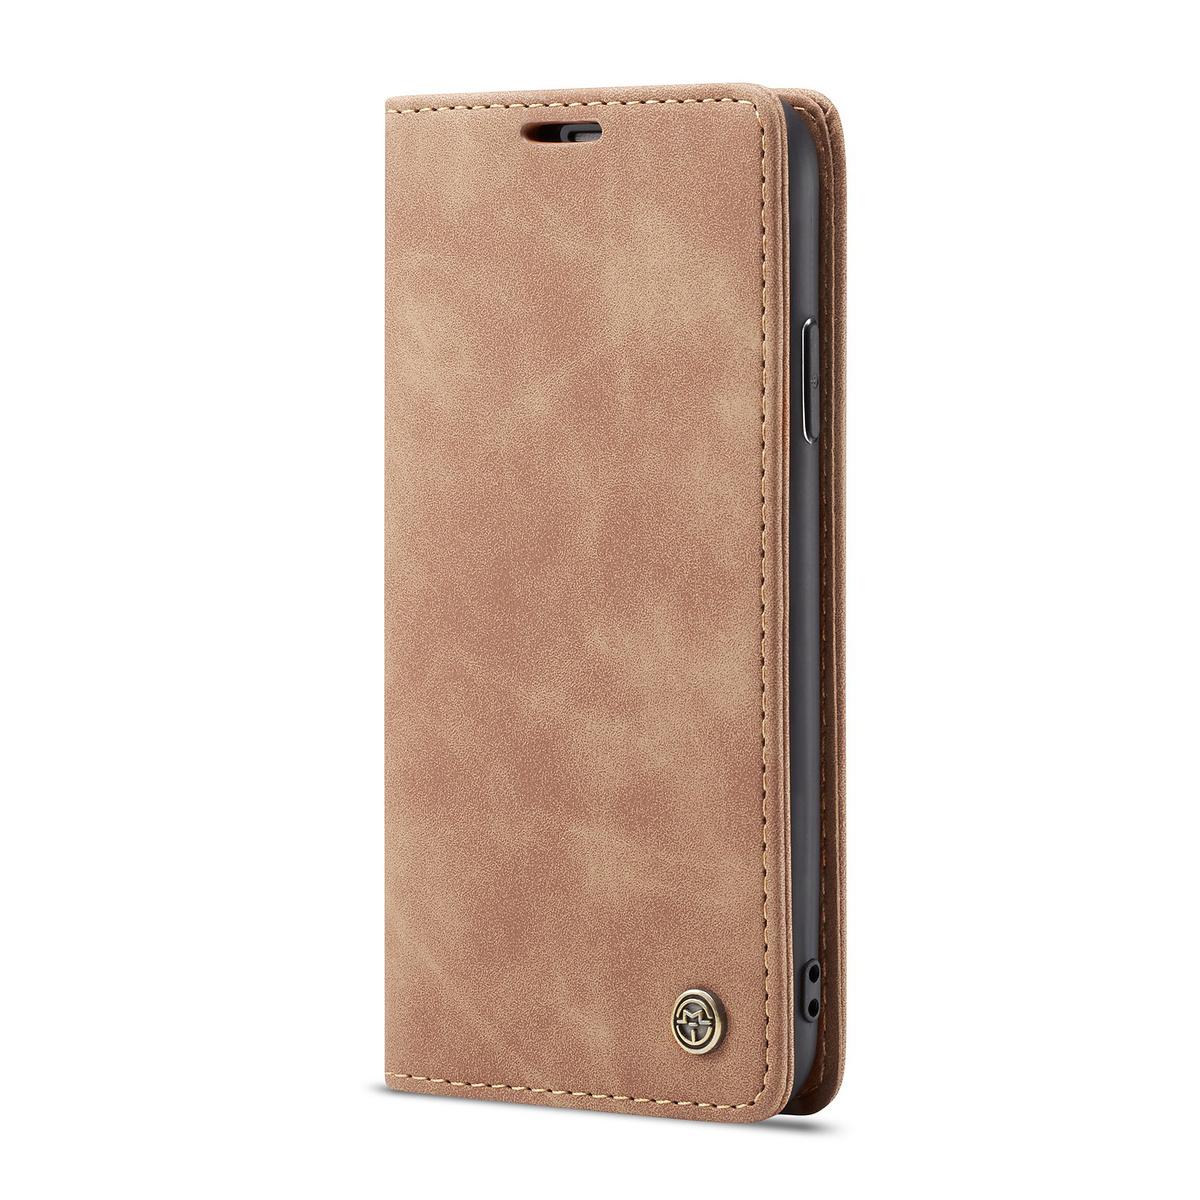 CaseMe plånboksfodral, iPhone X/XS, brun